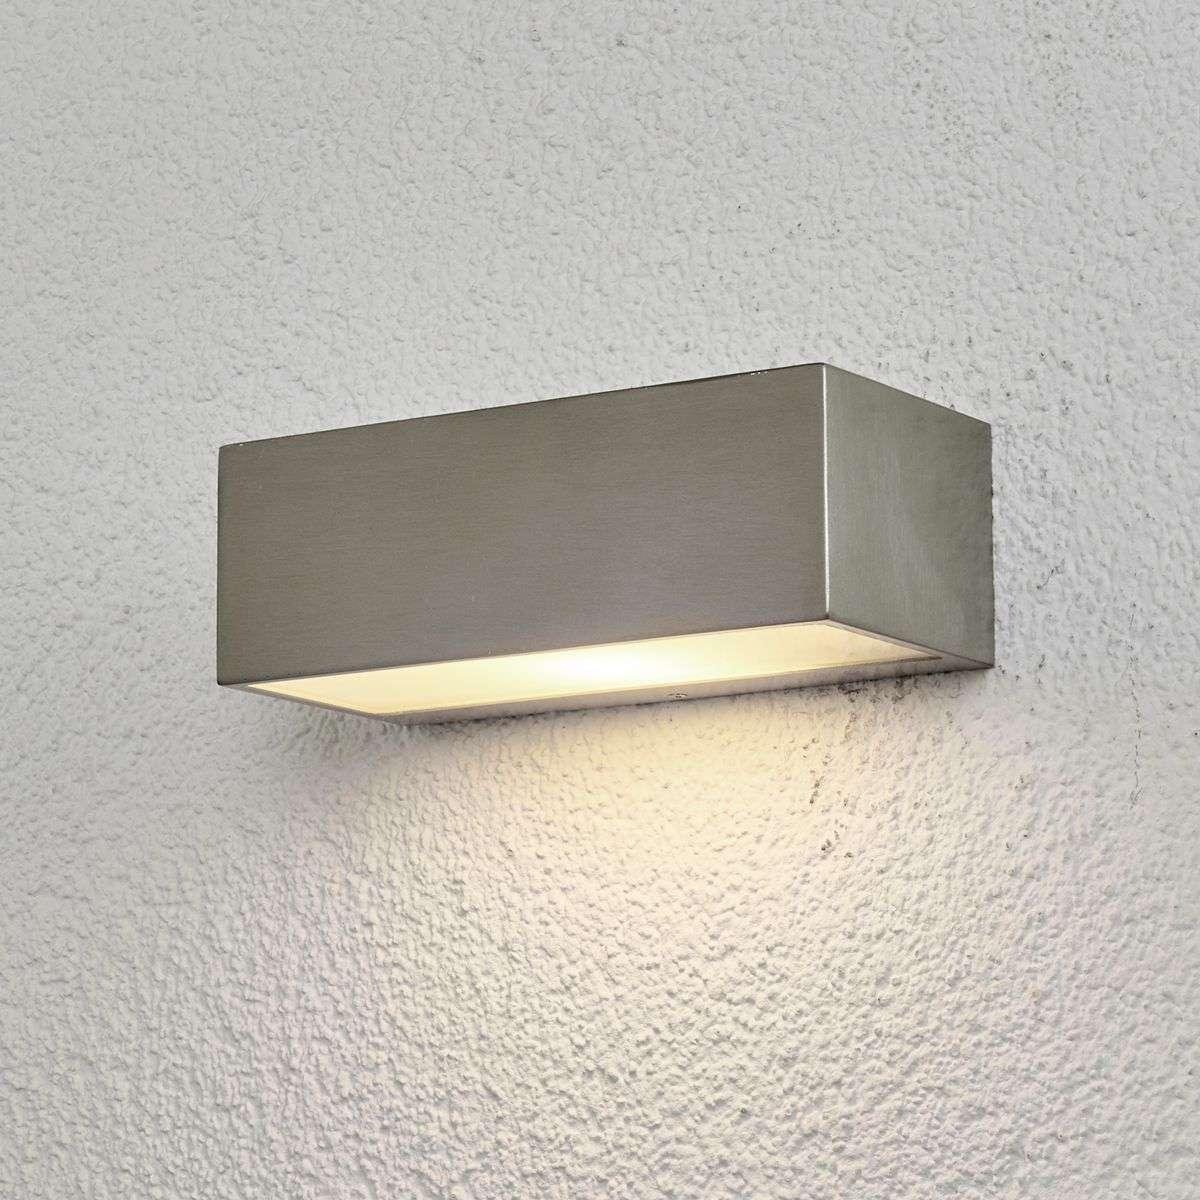 amazon wall stainless steel sensor saxby with light dp uk outdoor inova lighting co lights